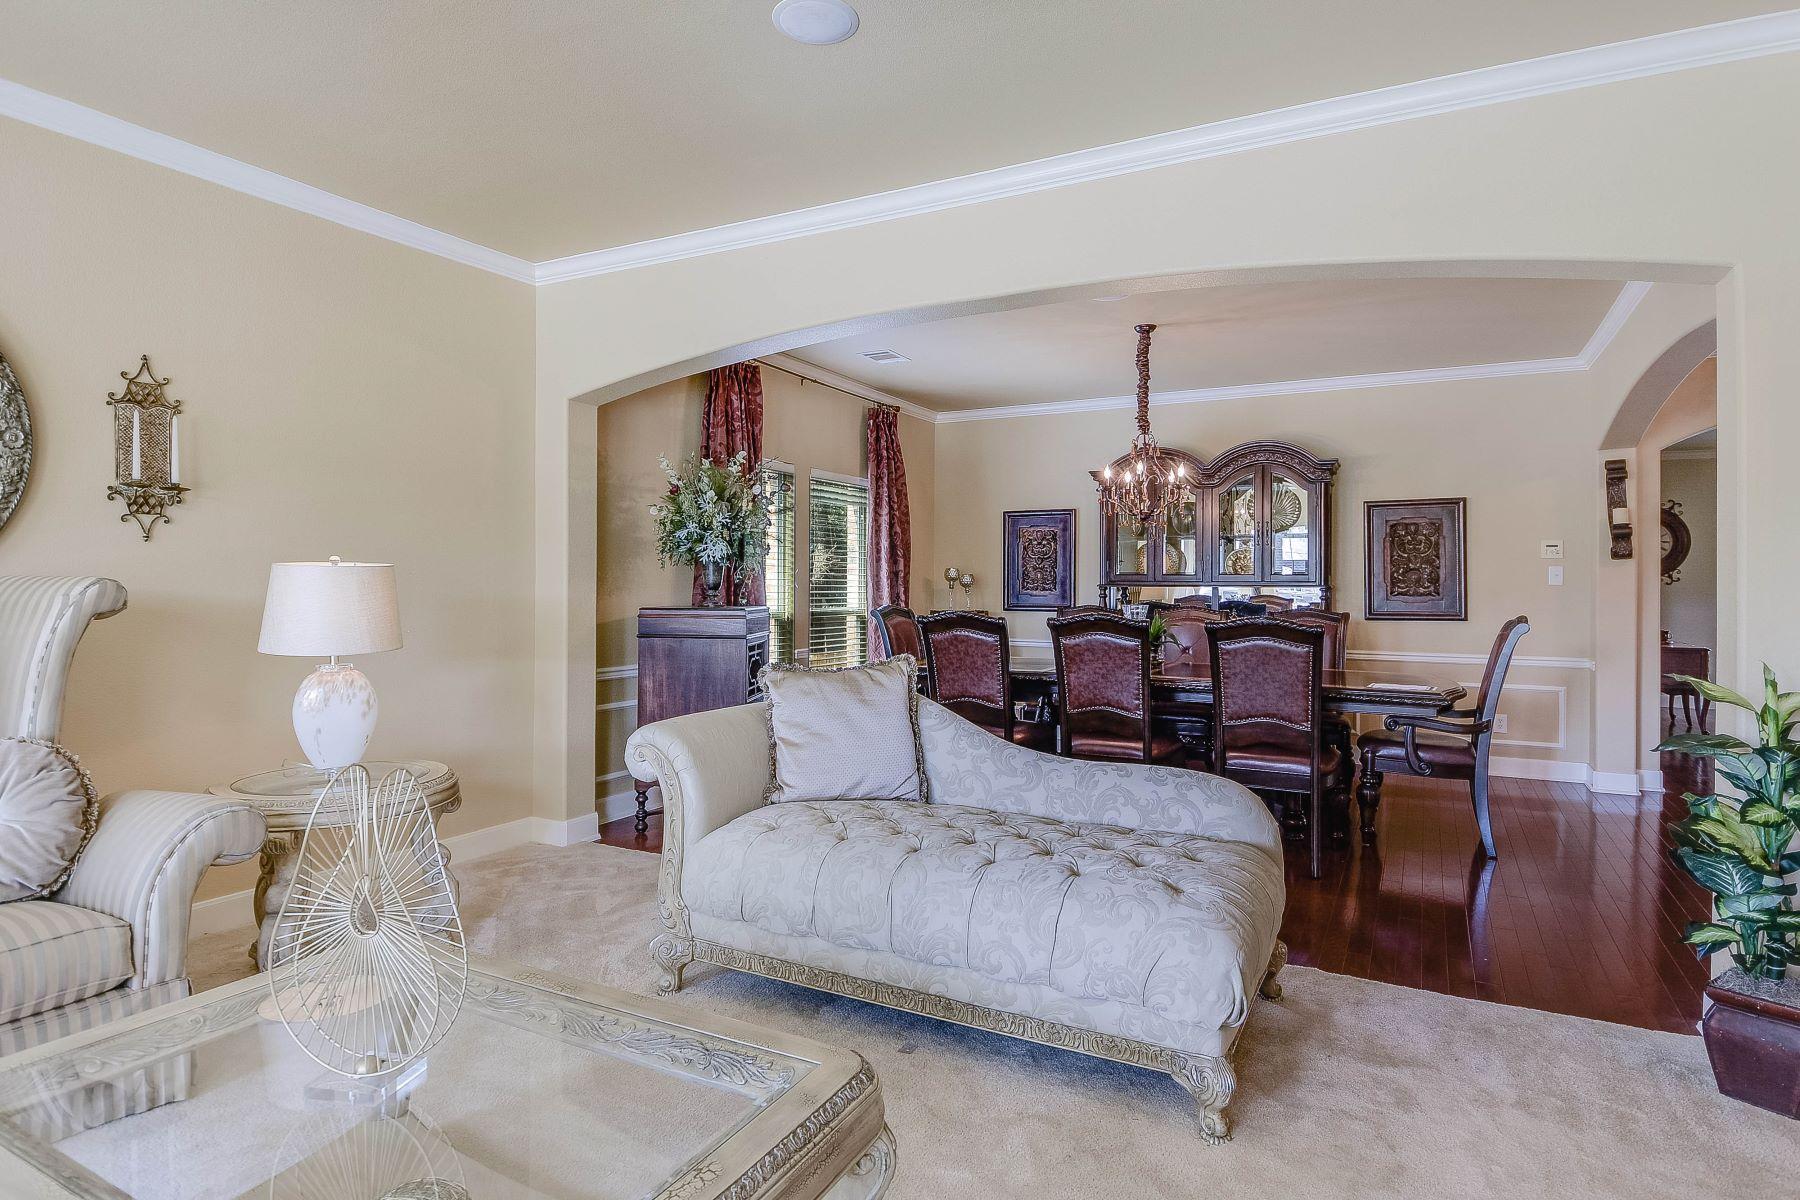 Additional photo for property listing at Stunning Home in Cedar Creek 16007 La Madera Rio San Antonio, Texas 78023 United States